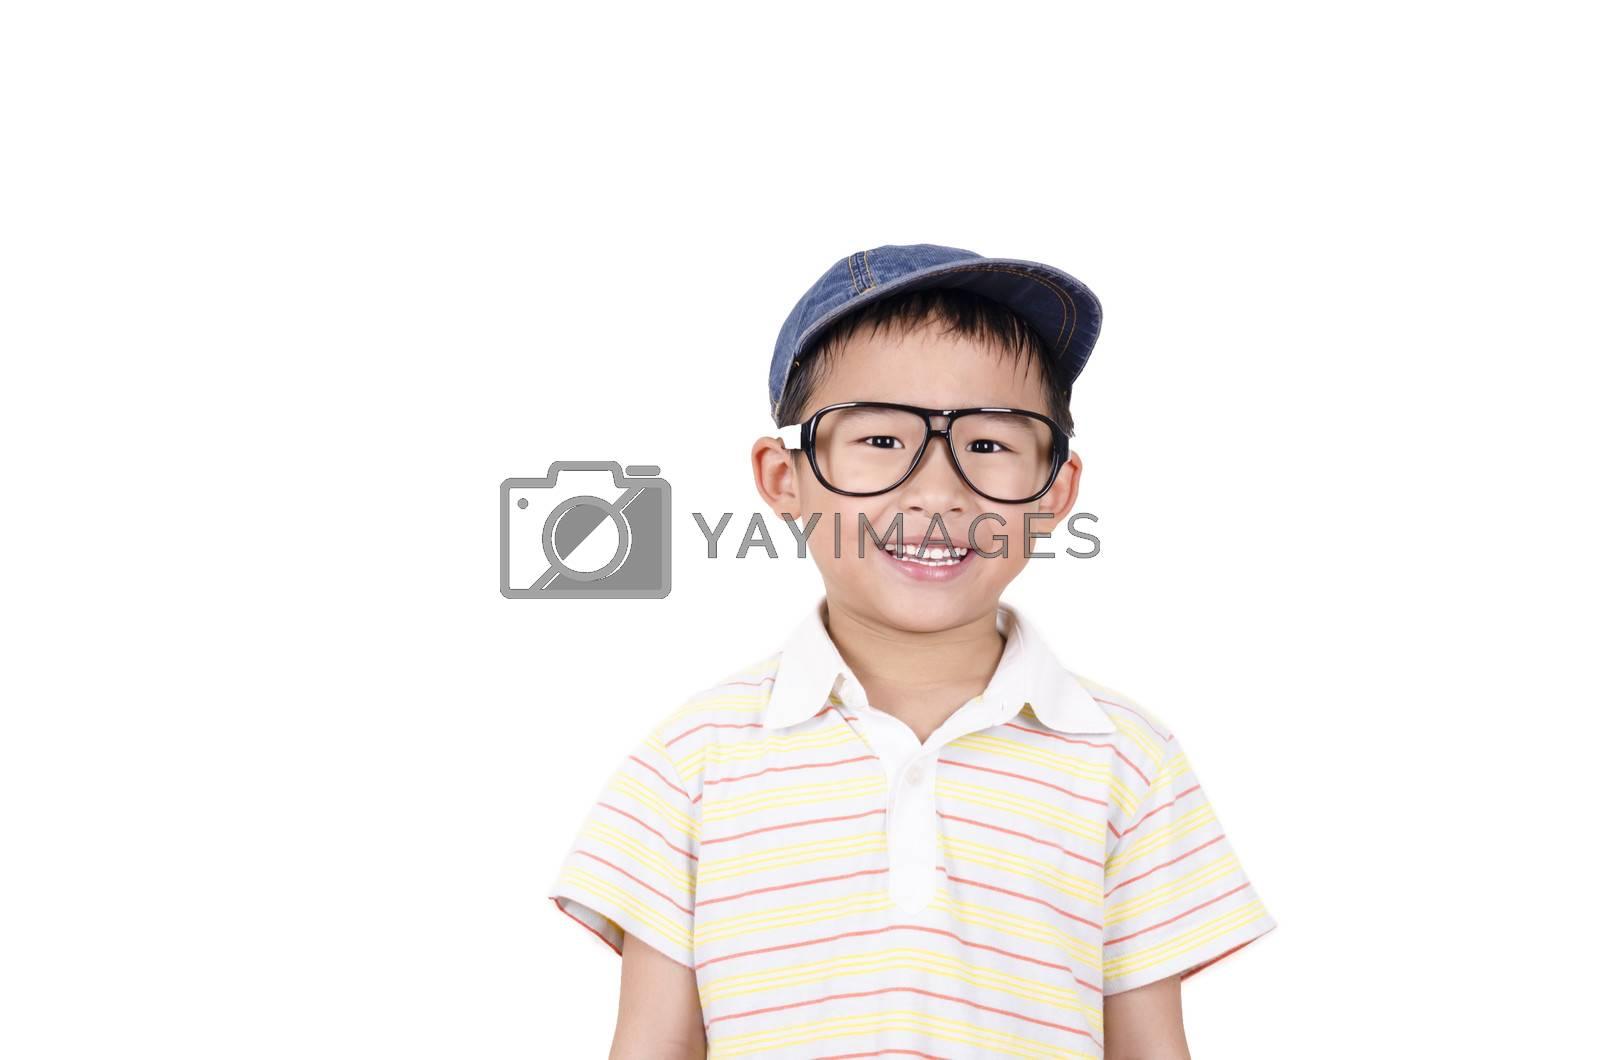 Royalty free image of Cute boy smiling by FrankyLiu